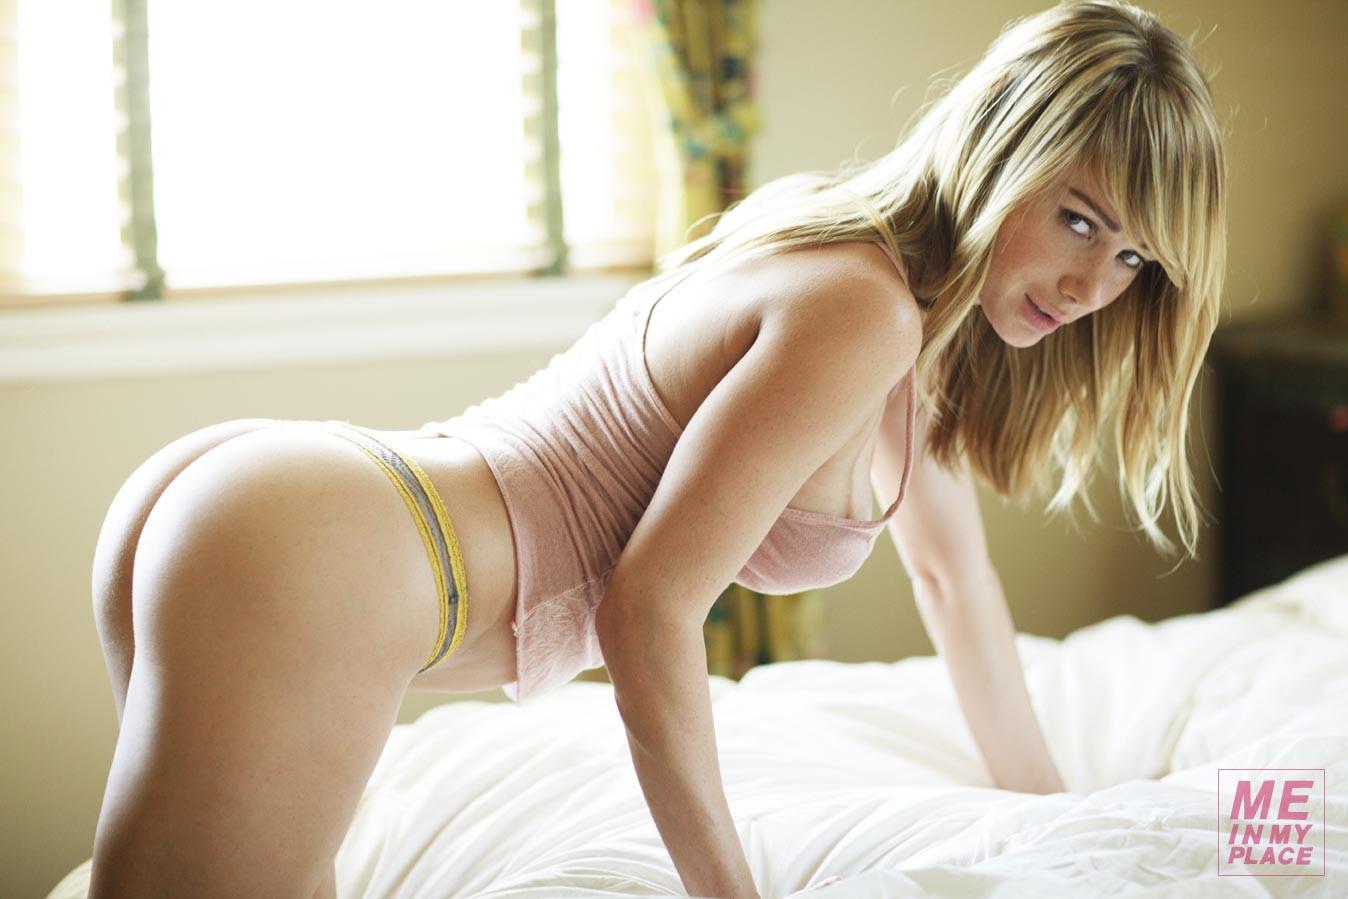 jean sex video